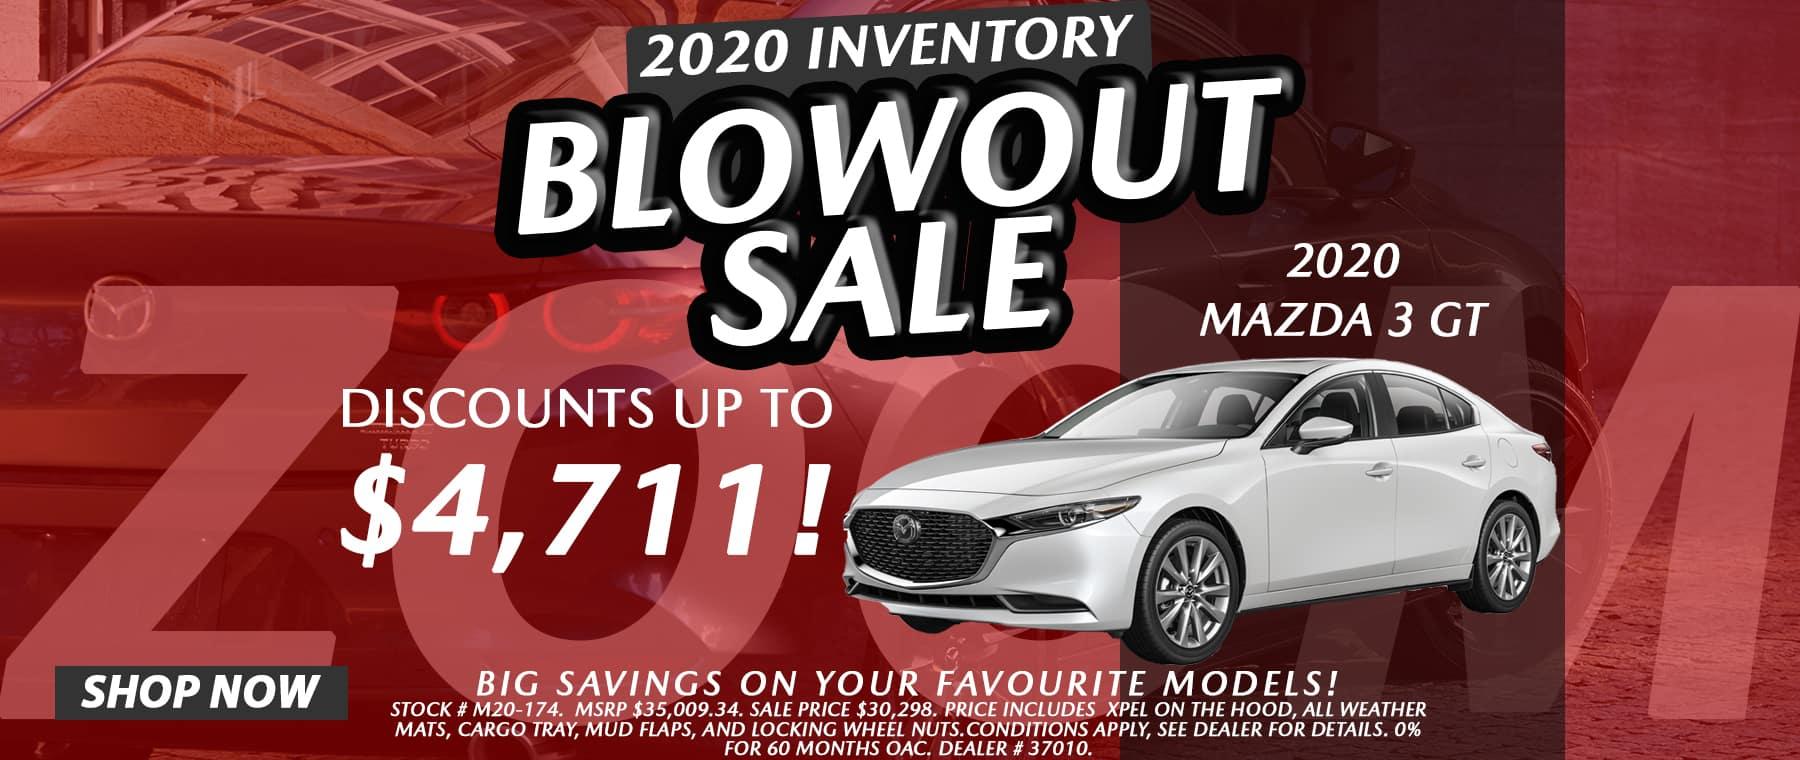 2020 Inventory Blowout Sale – Harris Mazda